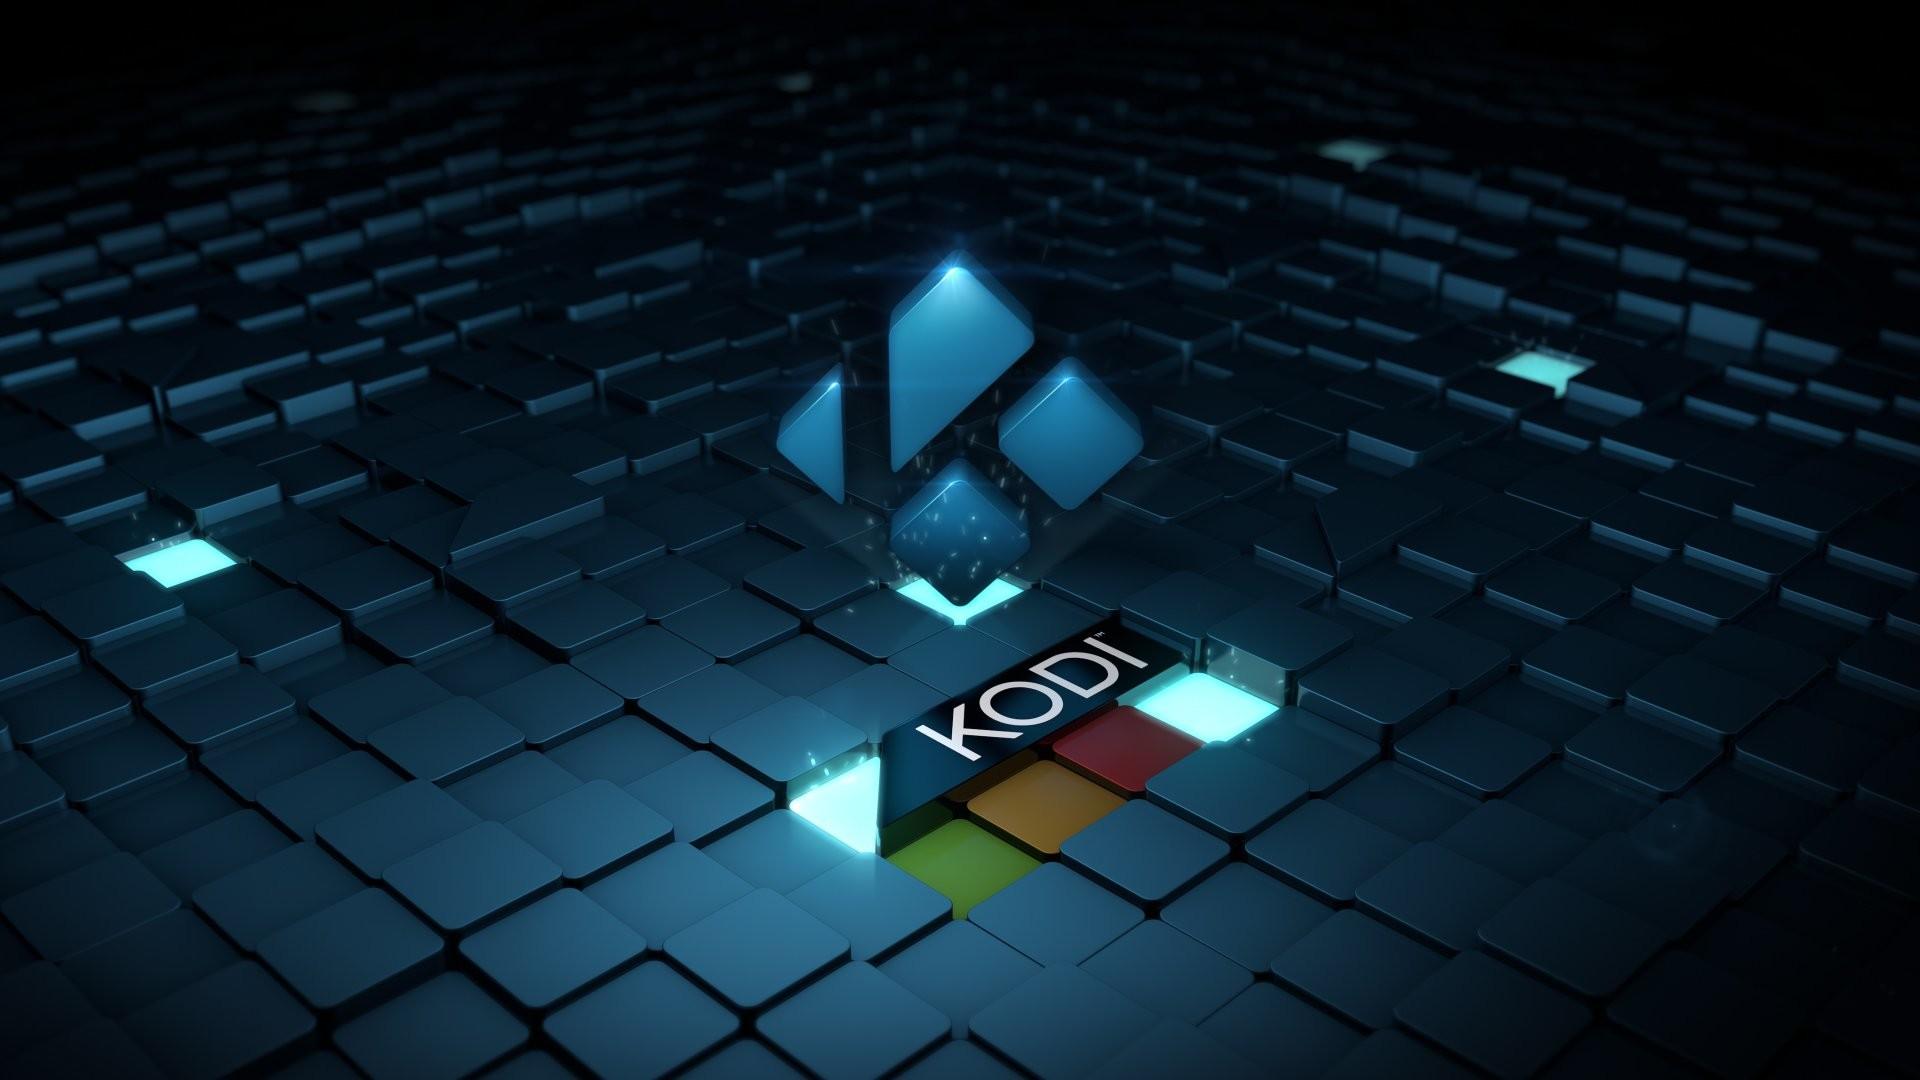 Kodi-Wallpaper-4A-1080p samfisher.jpg from samfisher